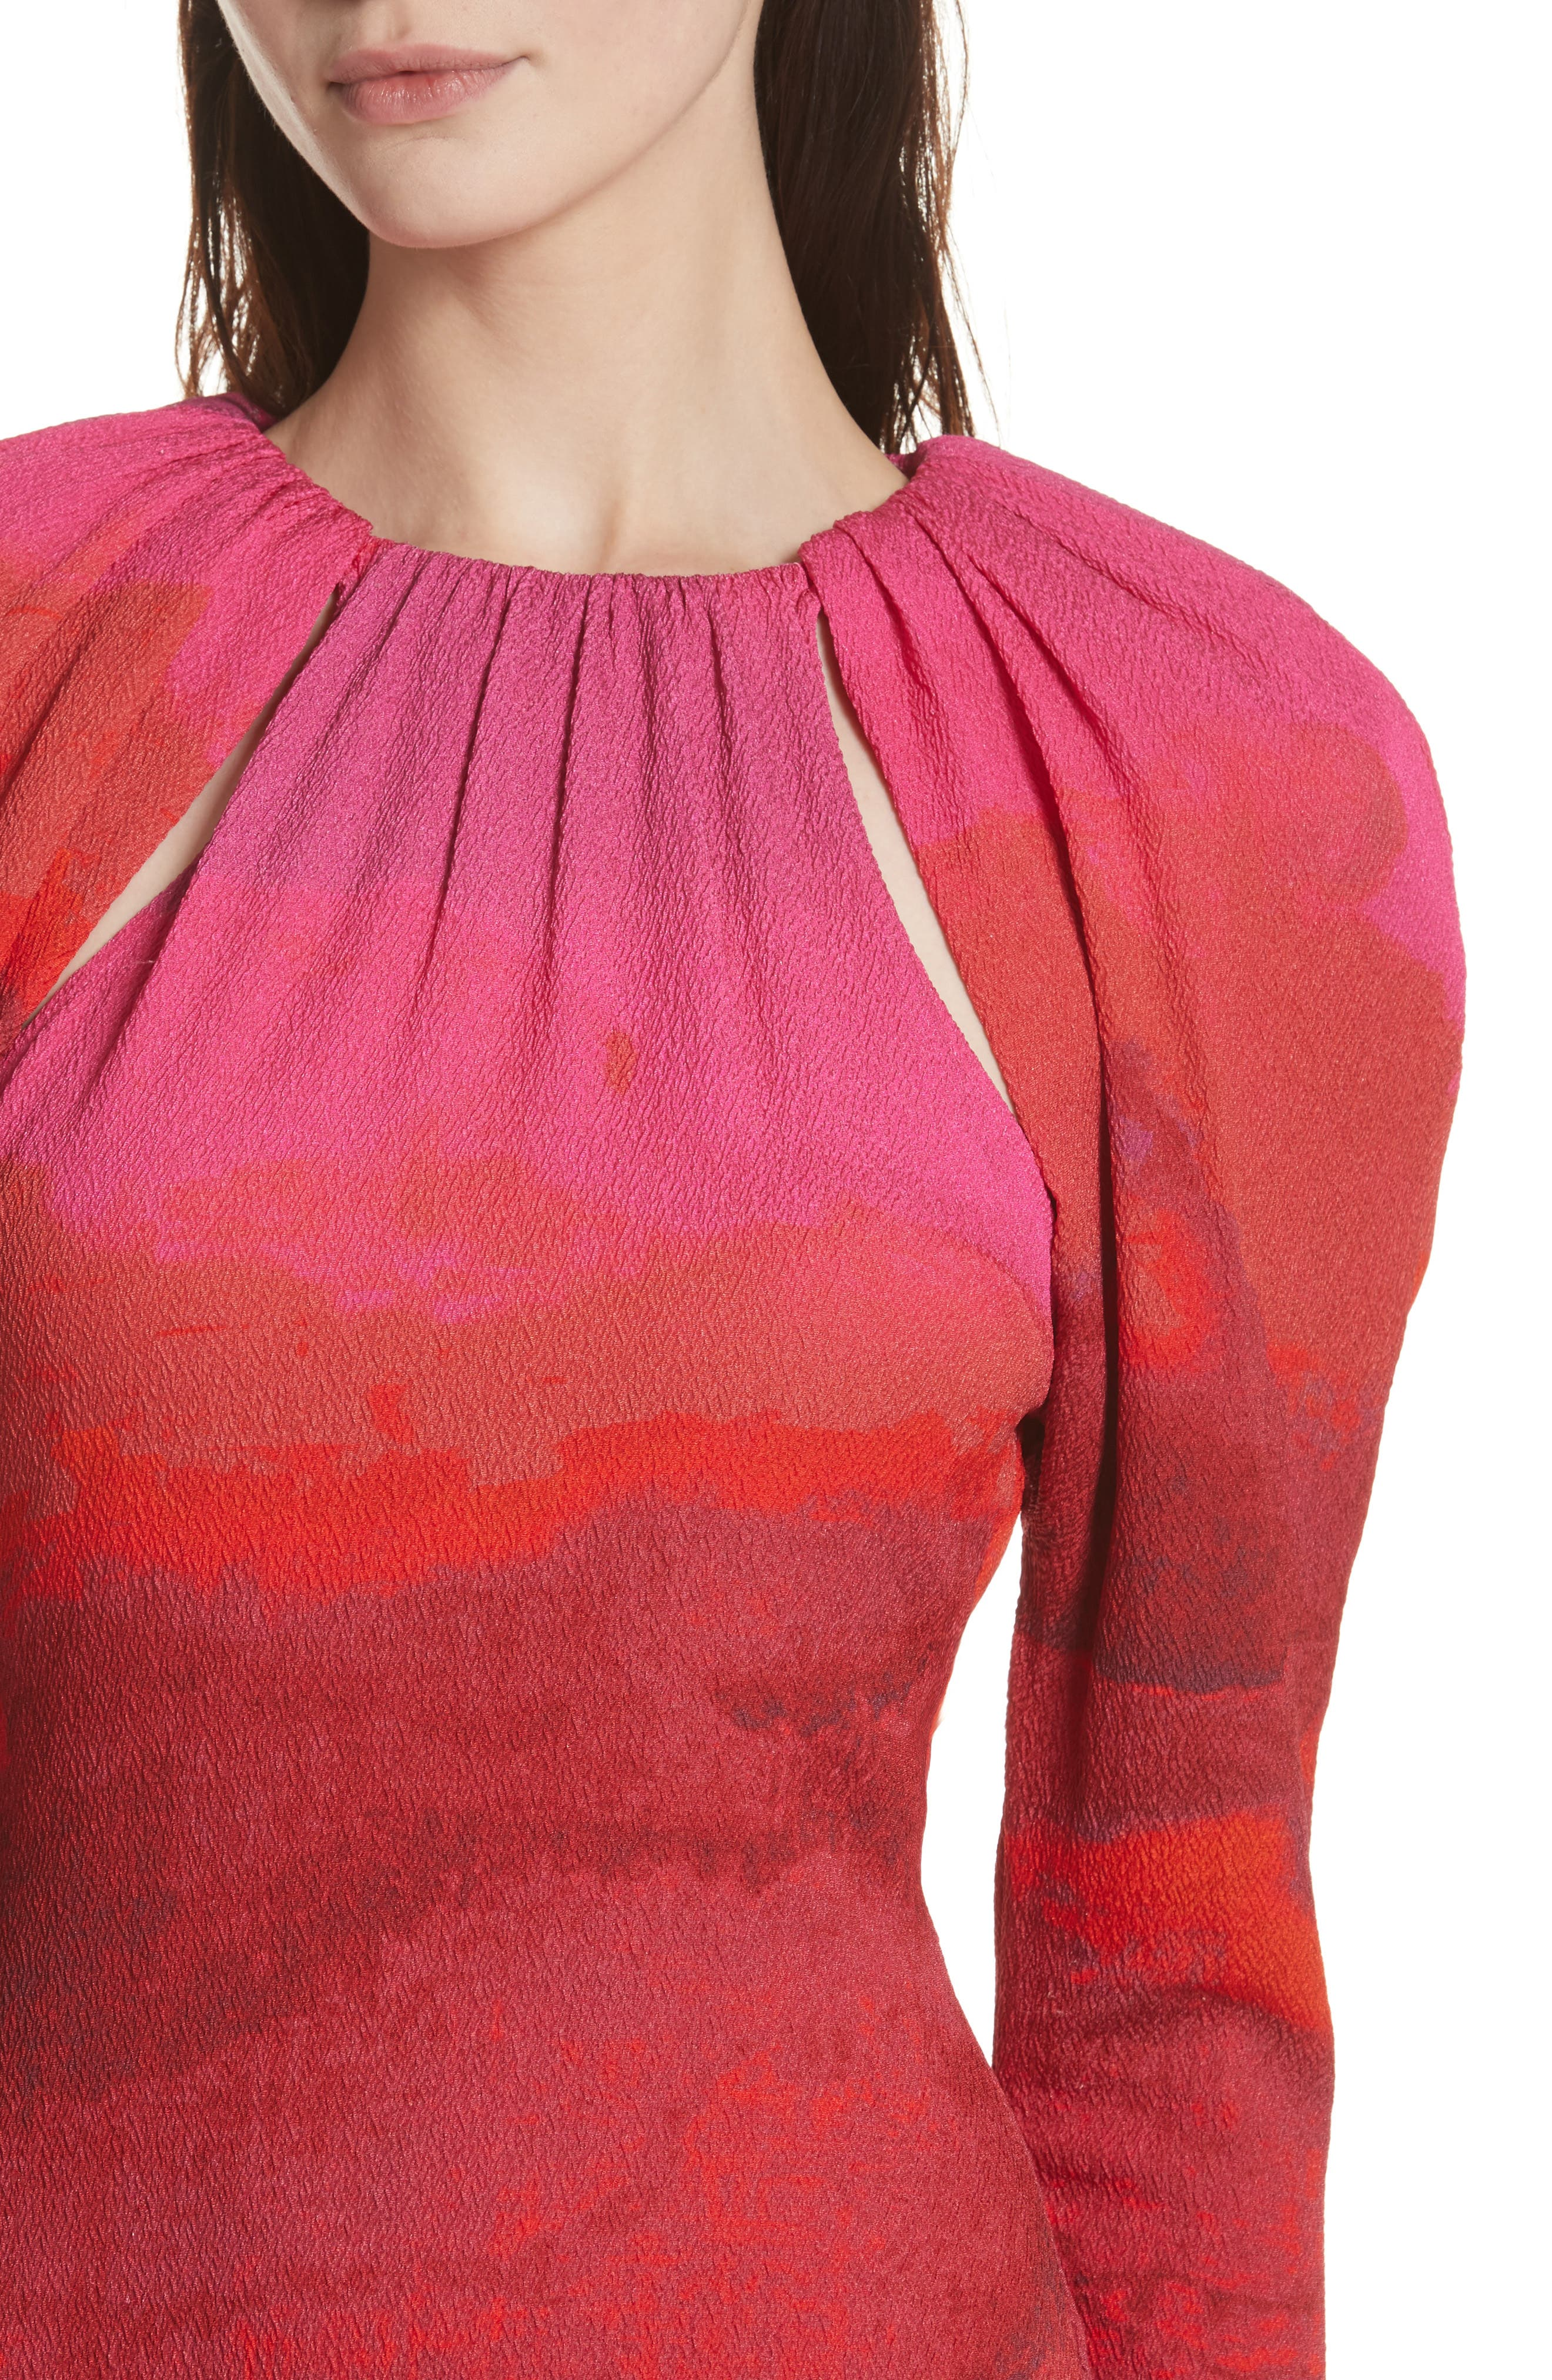 Abstract Print Stretch Silk Sheath Dress,                             Alternate thumbnail 4, color,                             605